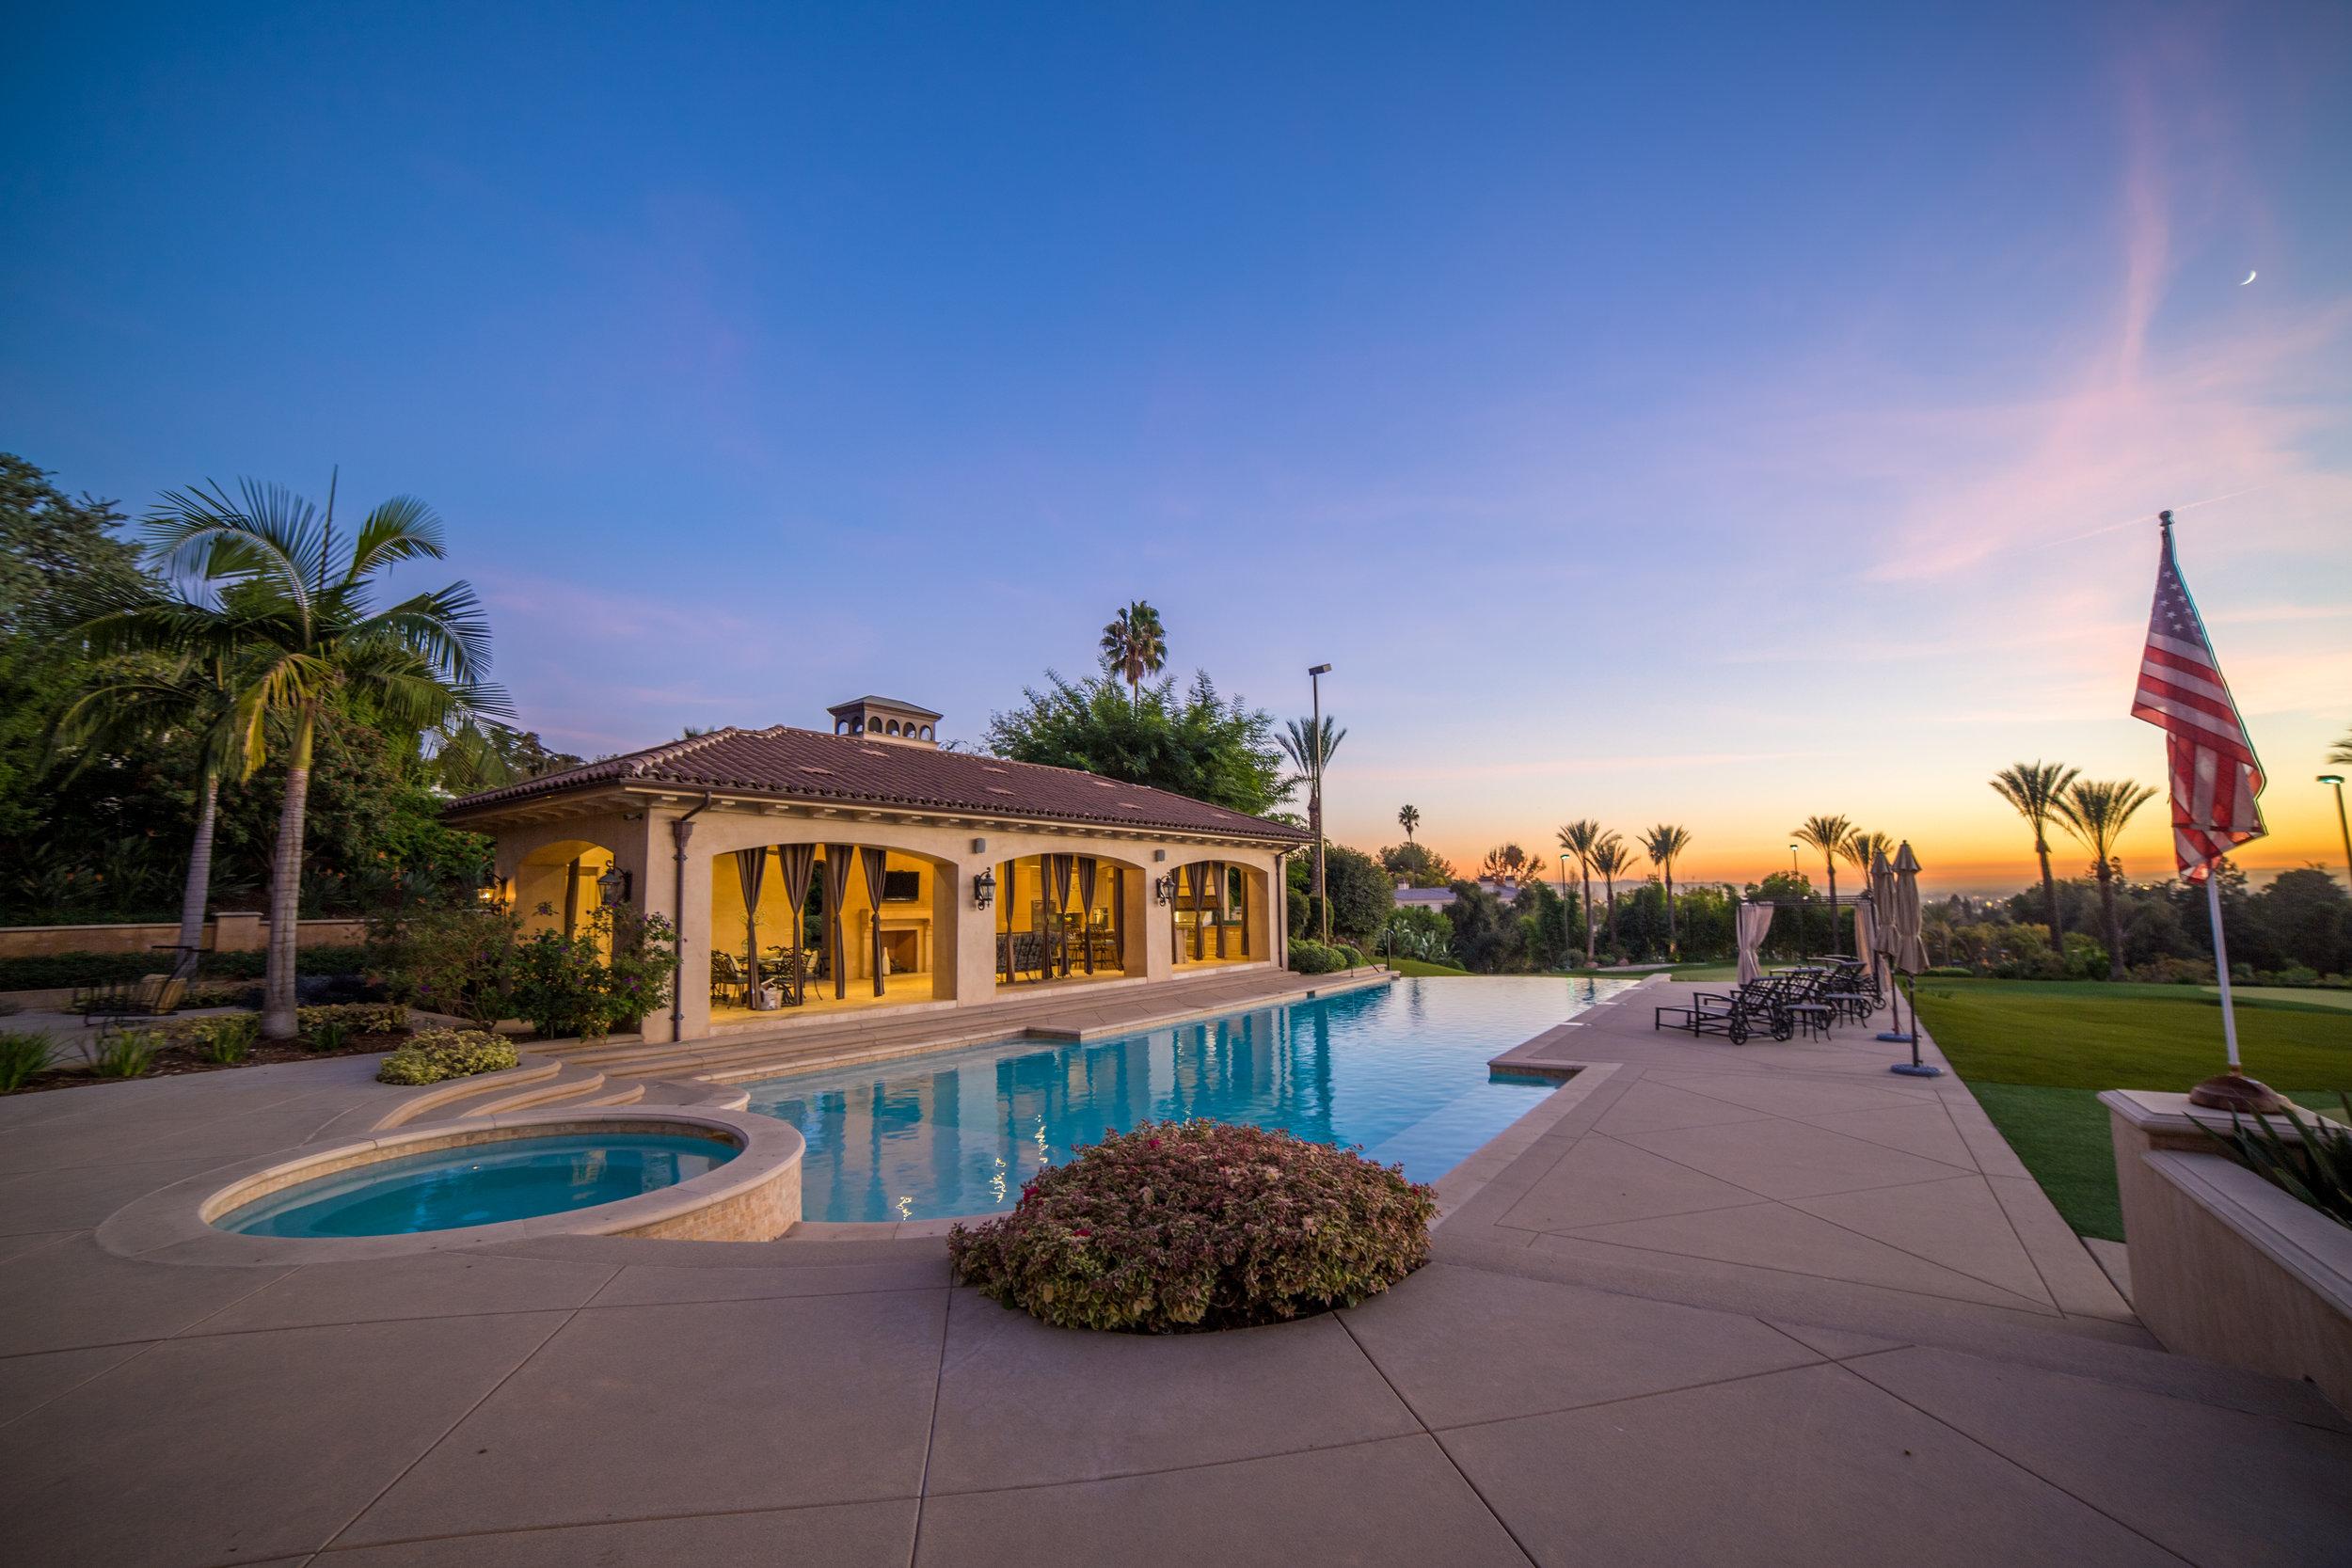 Real Estate Photography of Backyard Pool